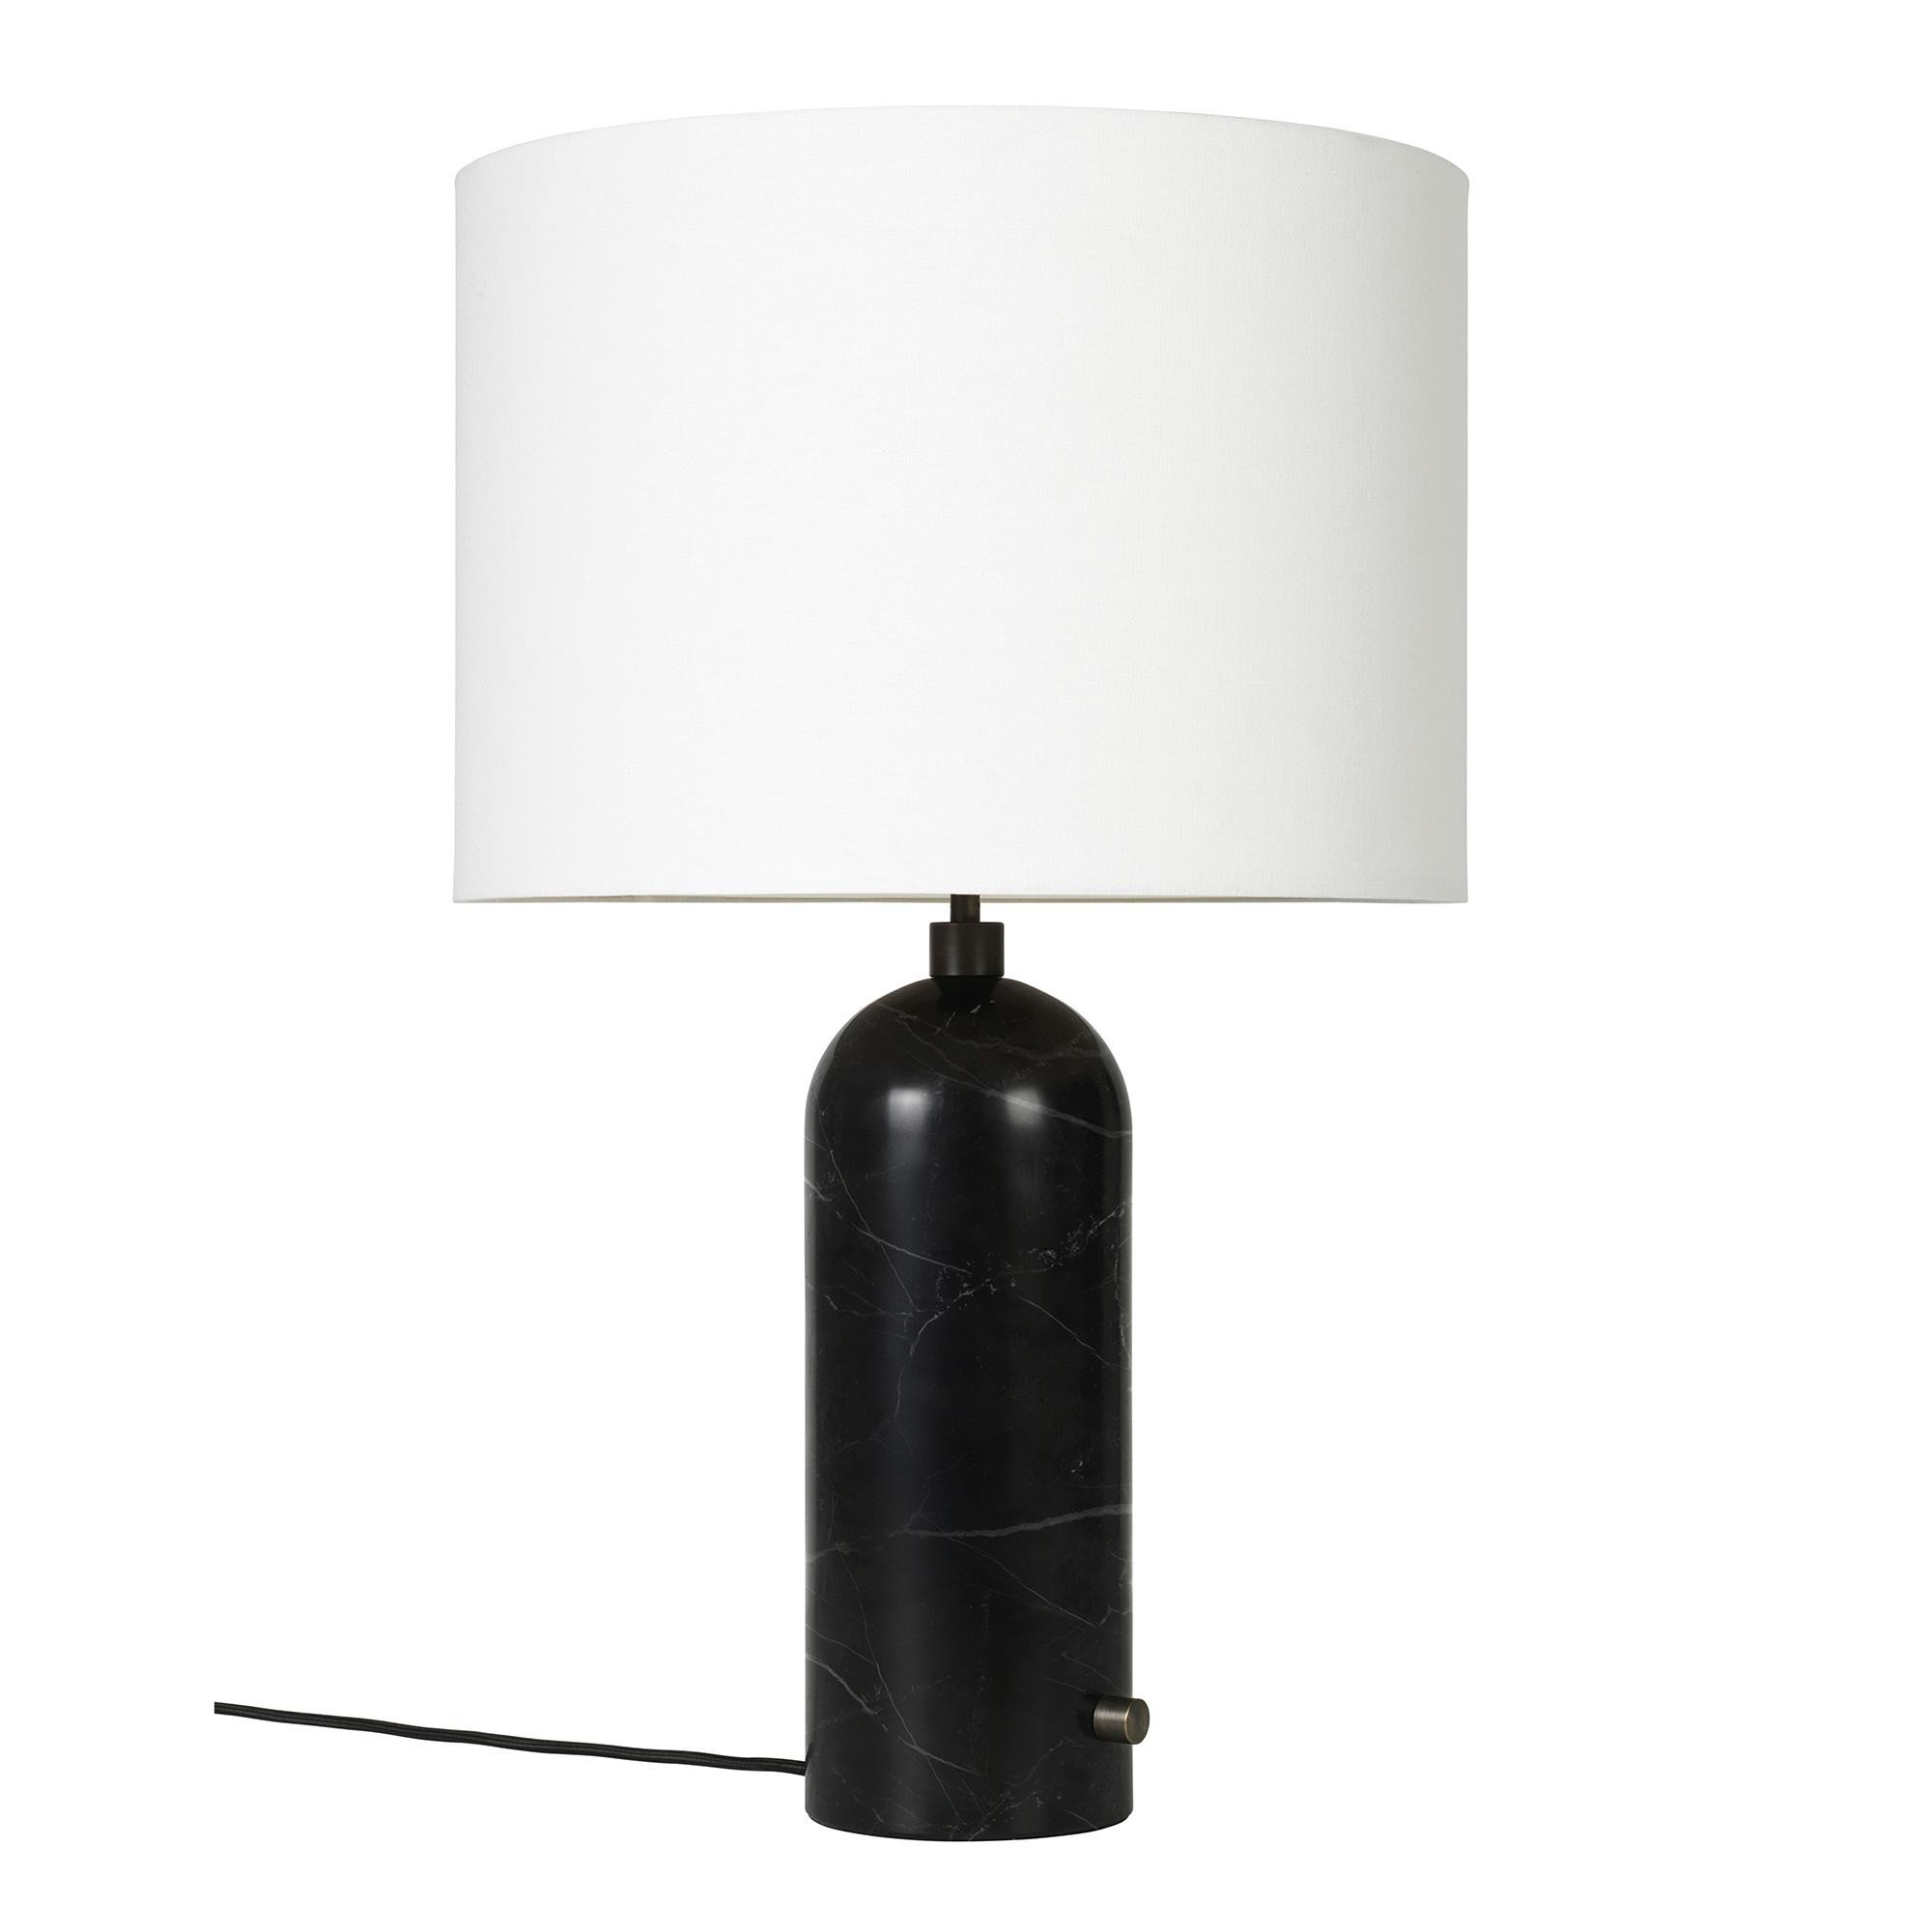 Gubi Gravity Table Lamp L | AmbienteDirect